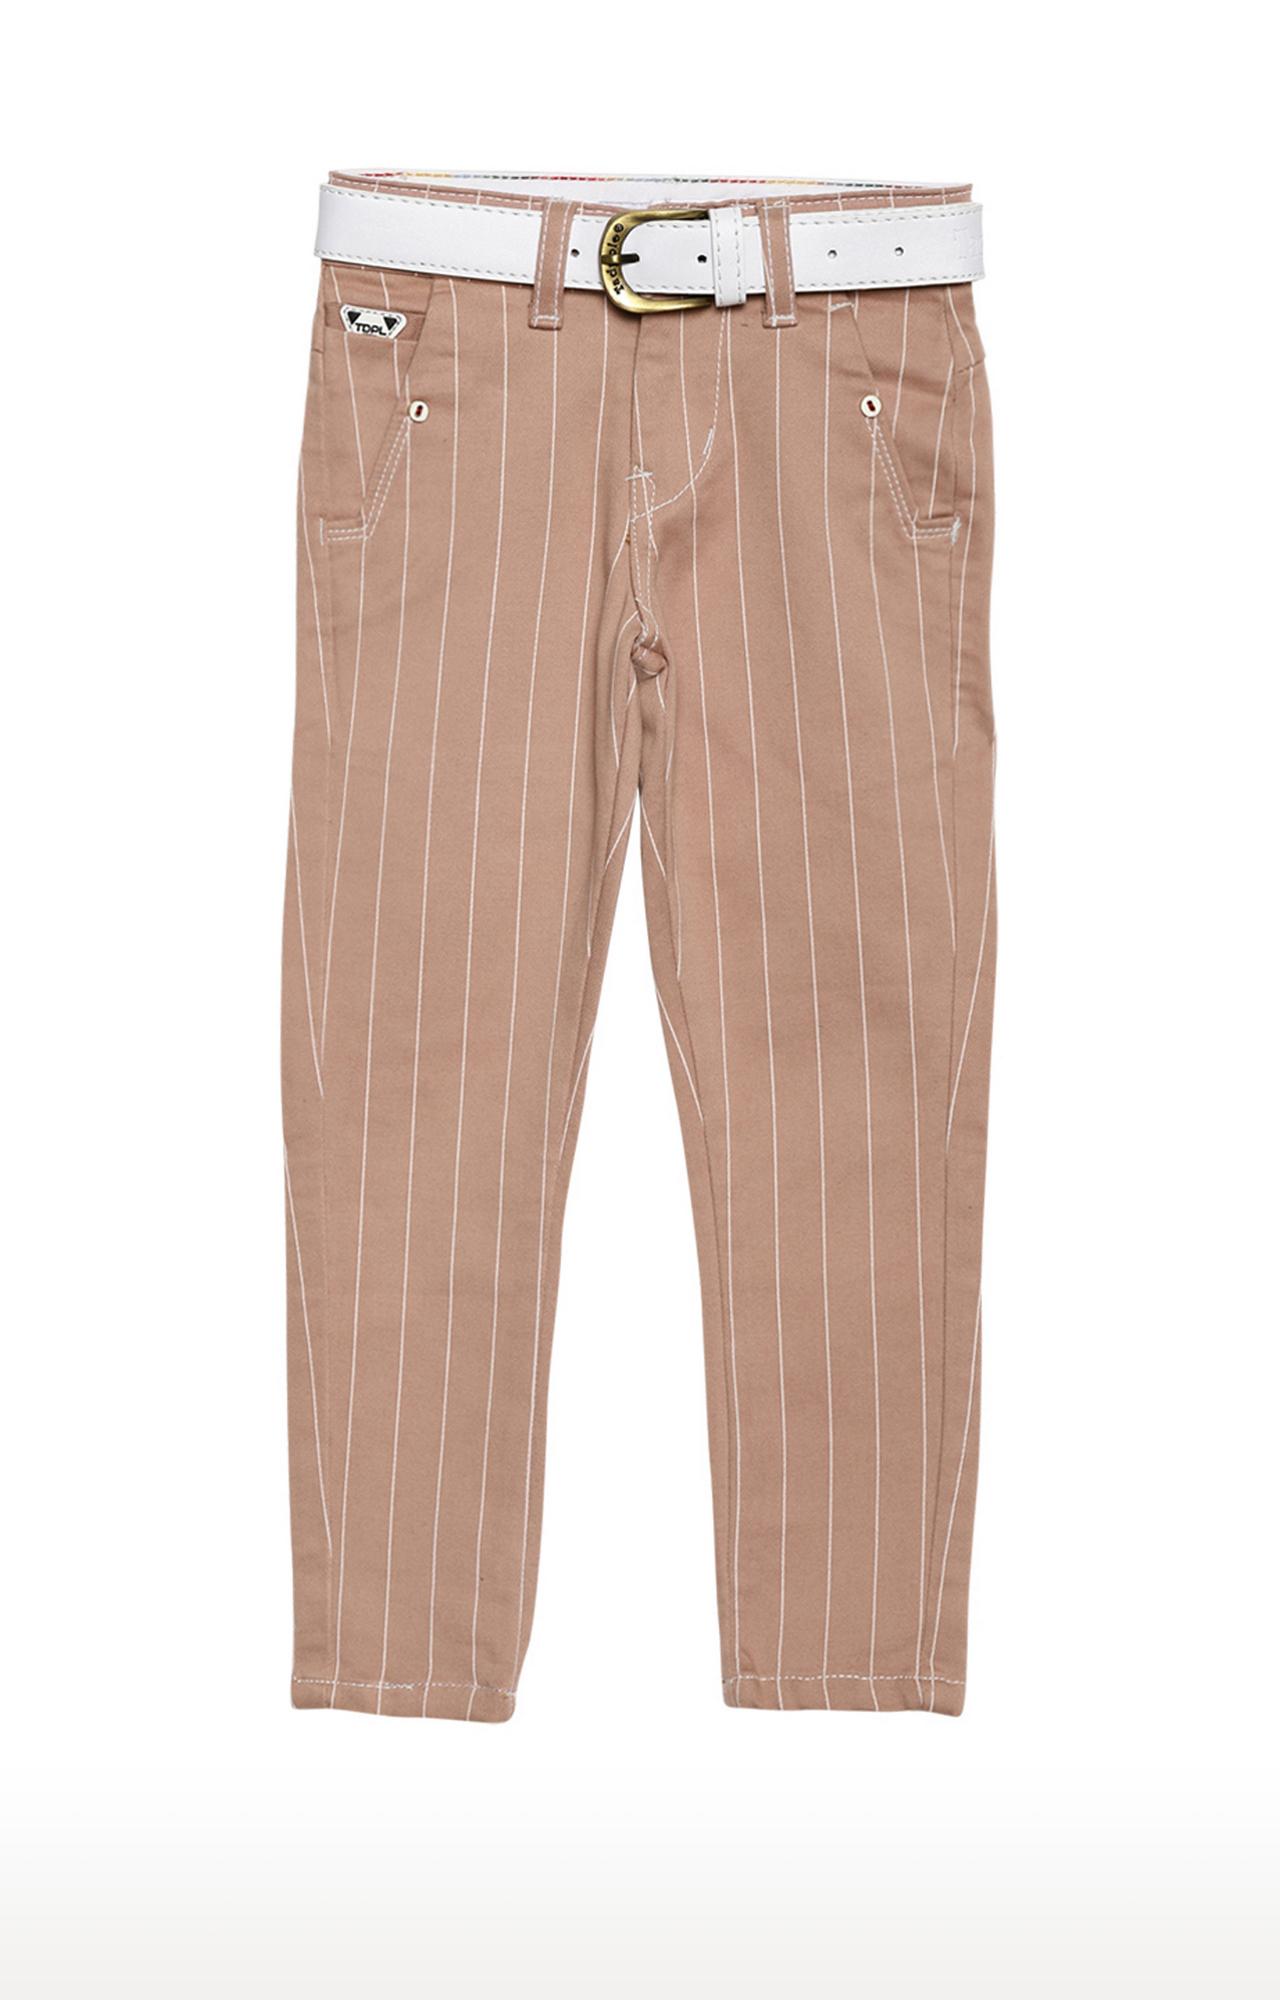 Tadpole | Peach Striped Regular-Fit Jeans